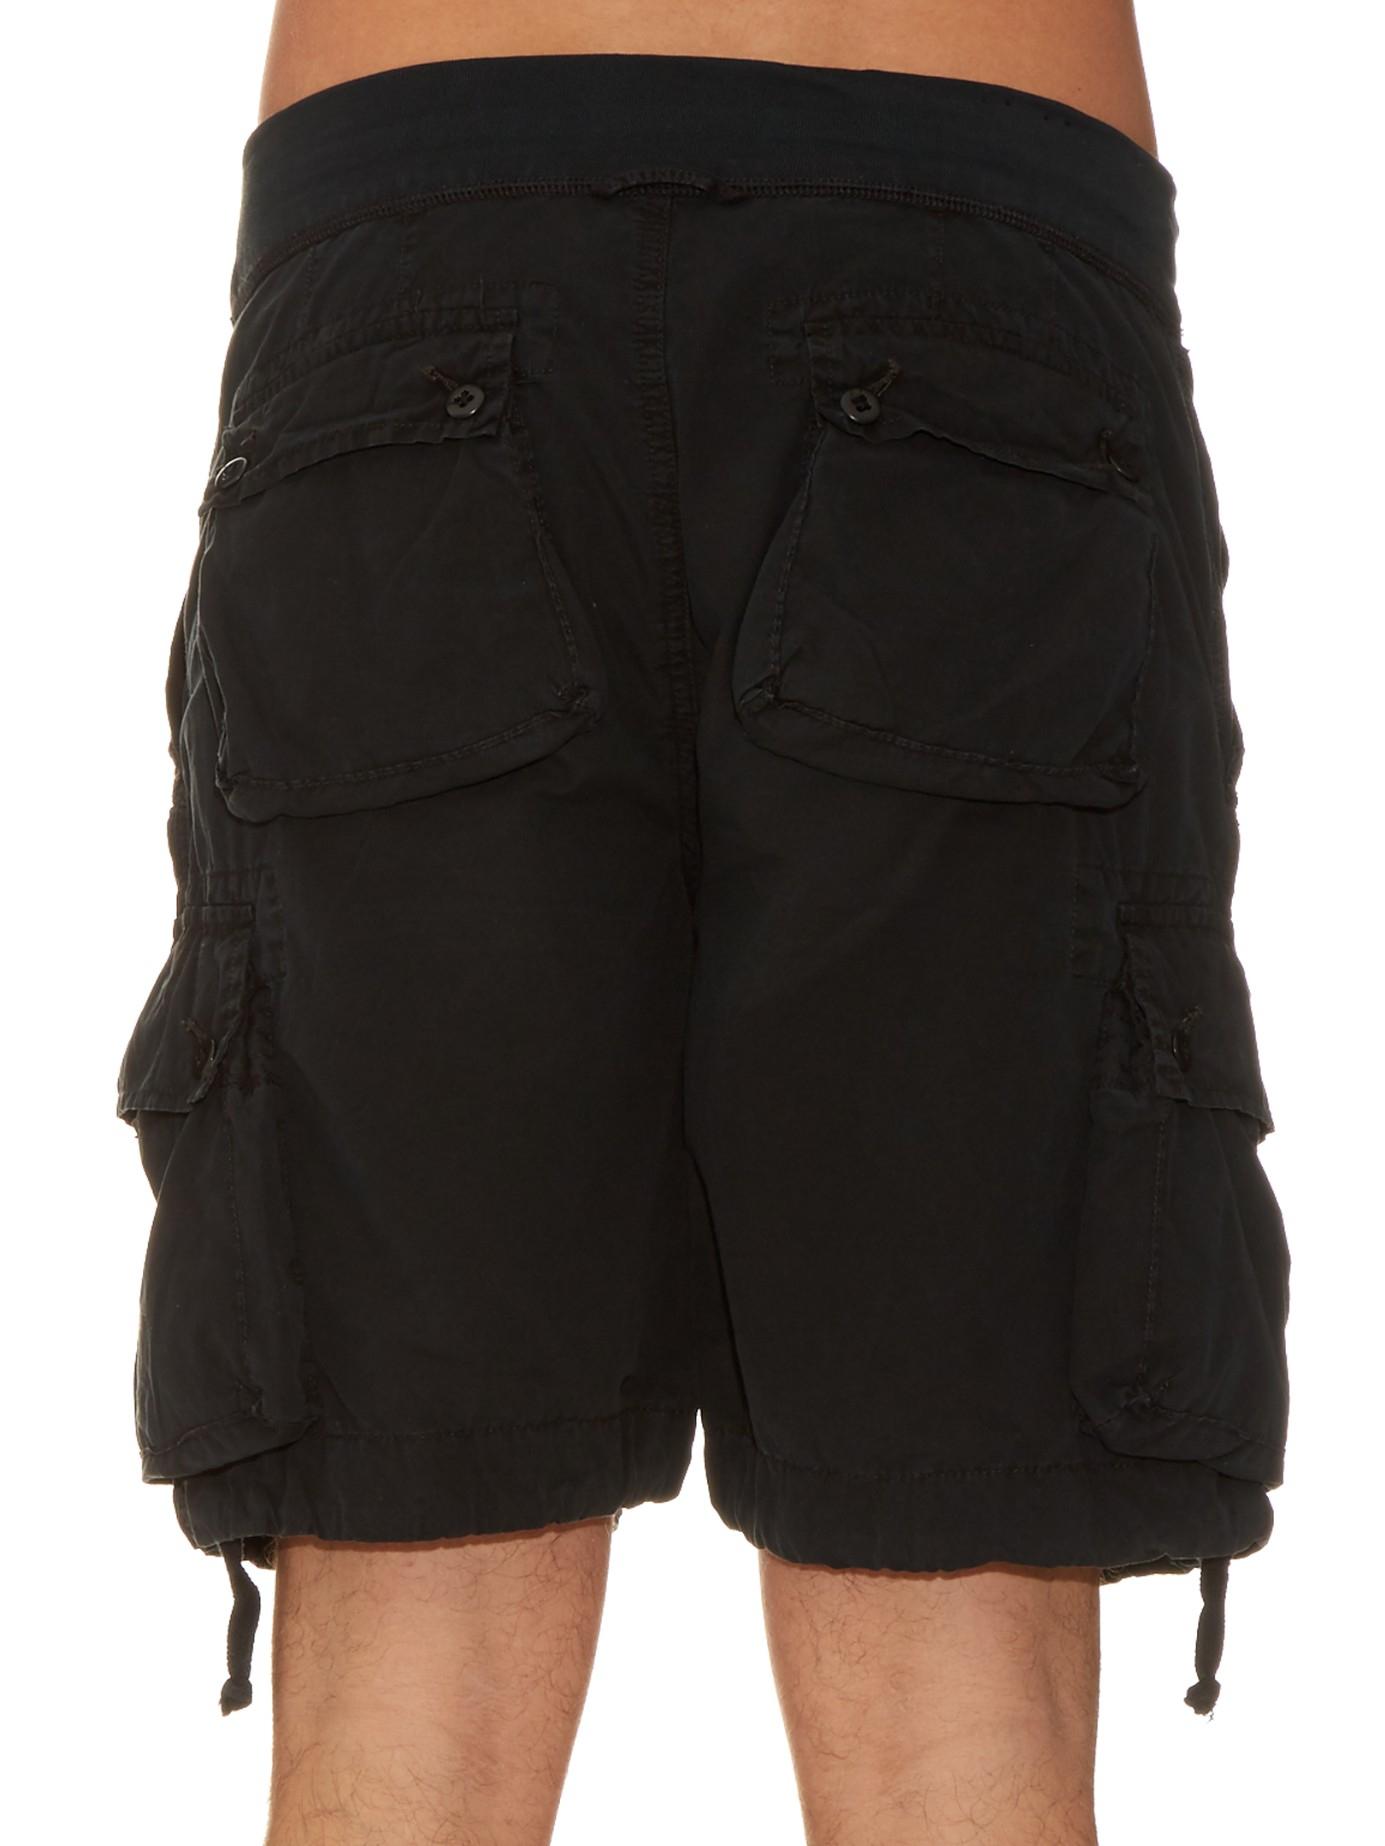 54ac655e0ad6 ... australia lyst polo ralph lauren brushed cotton cargo shorts in black  for men 2e24d 65e75